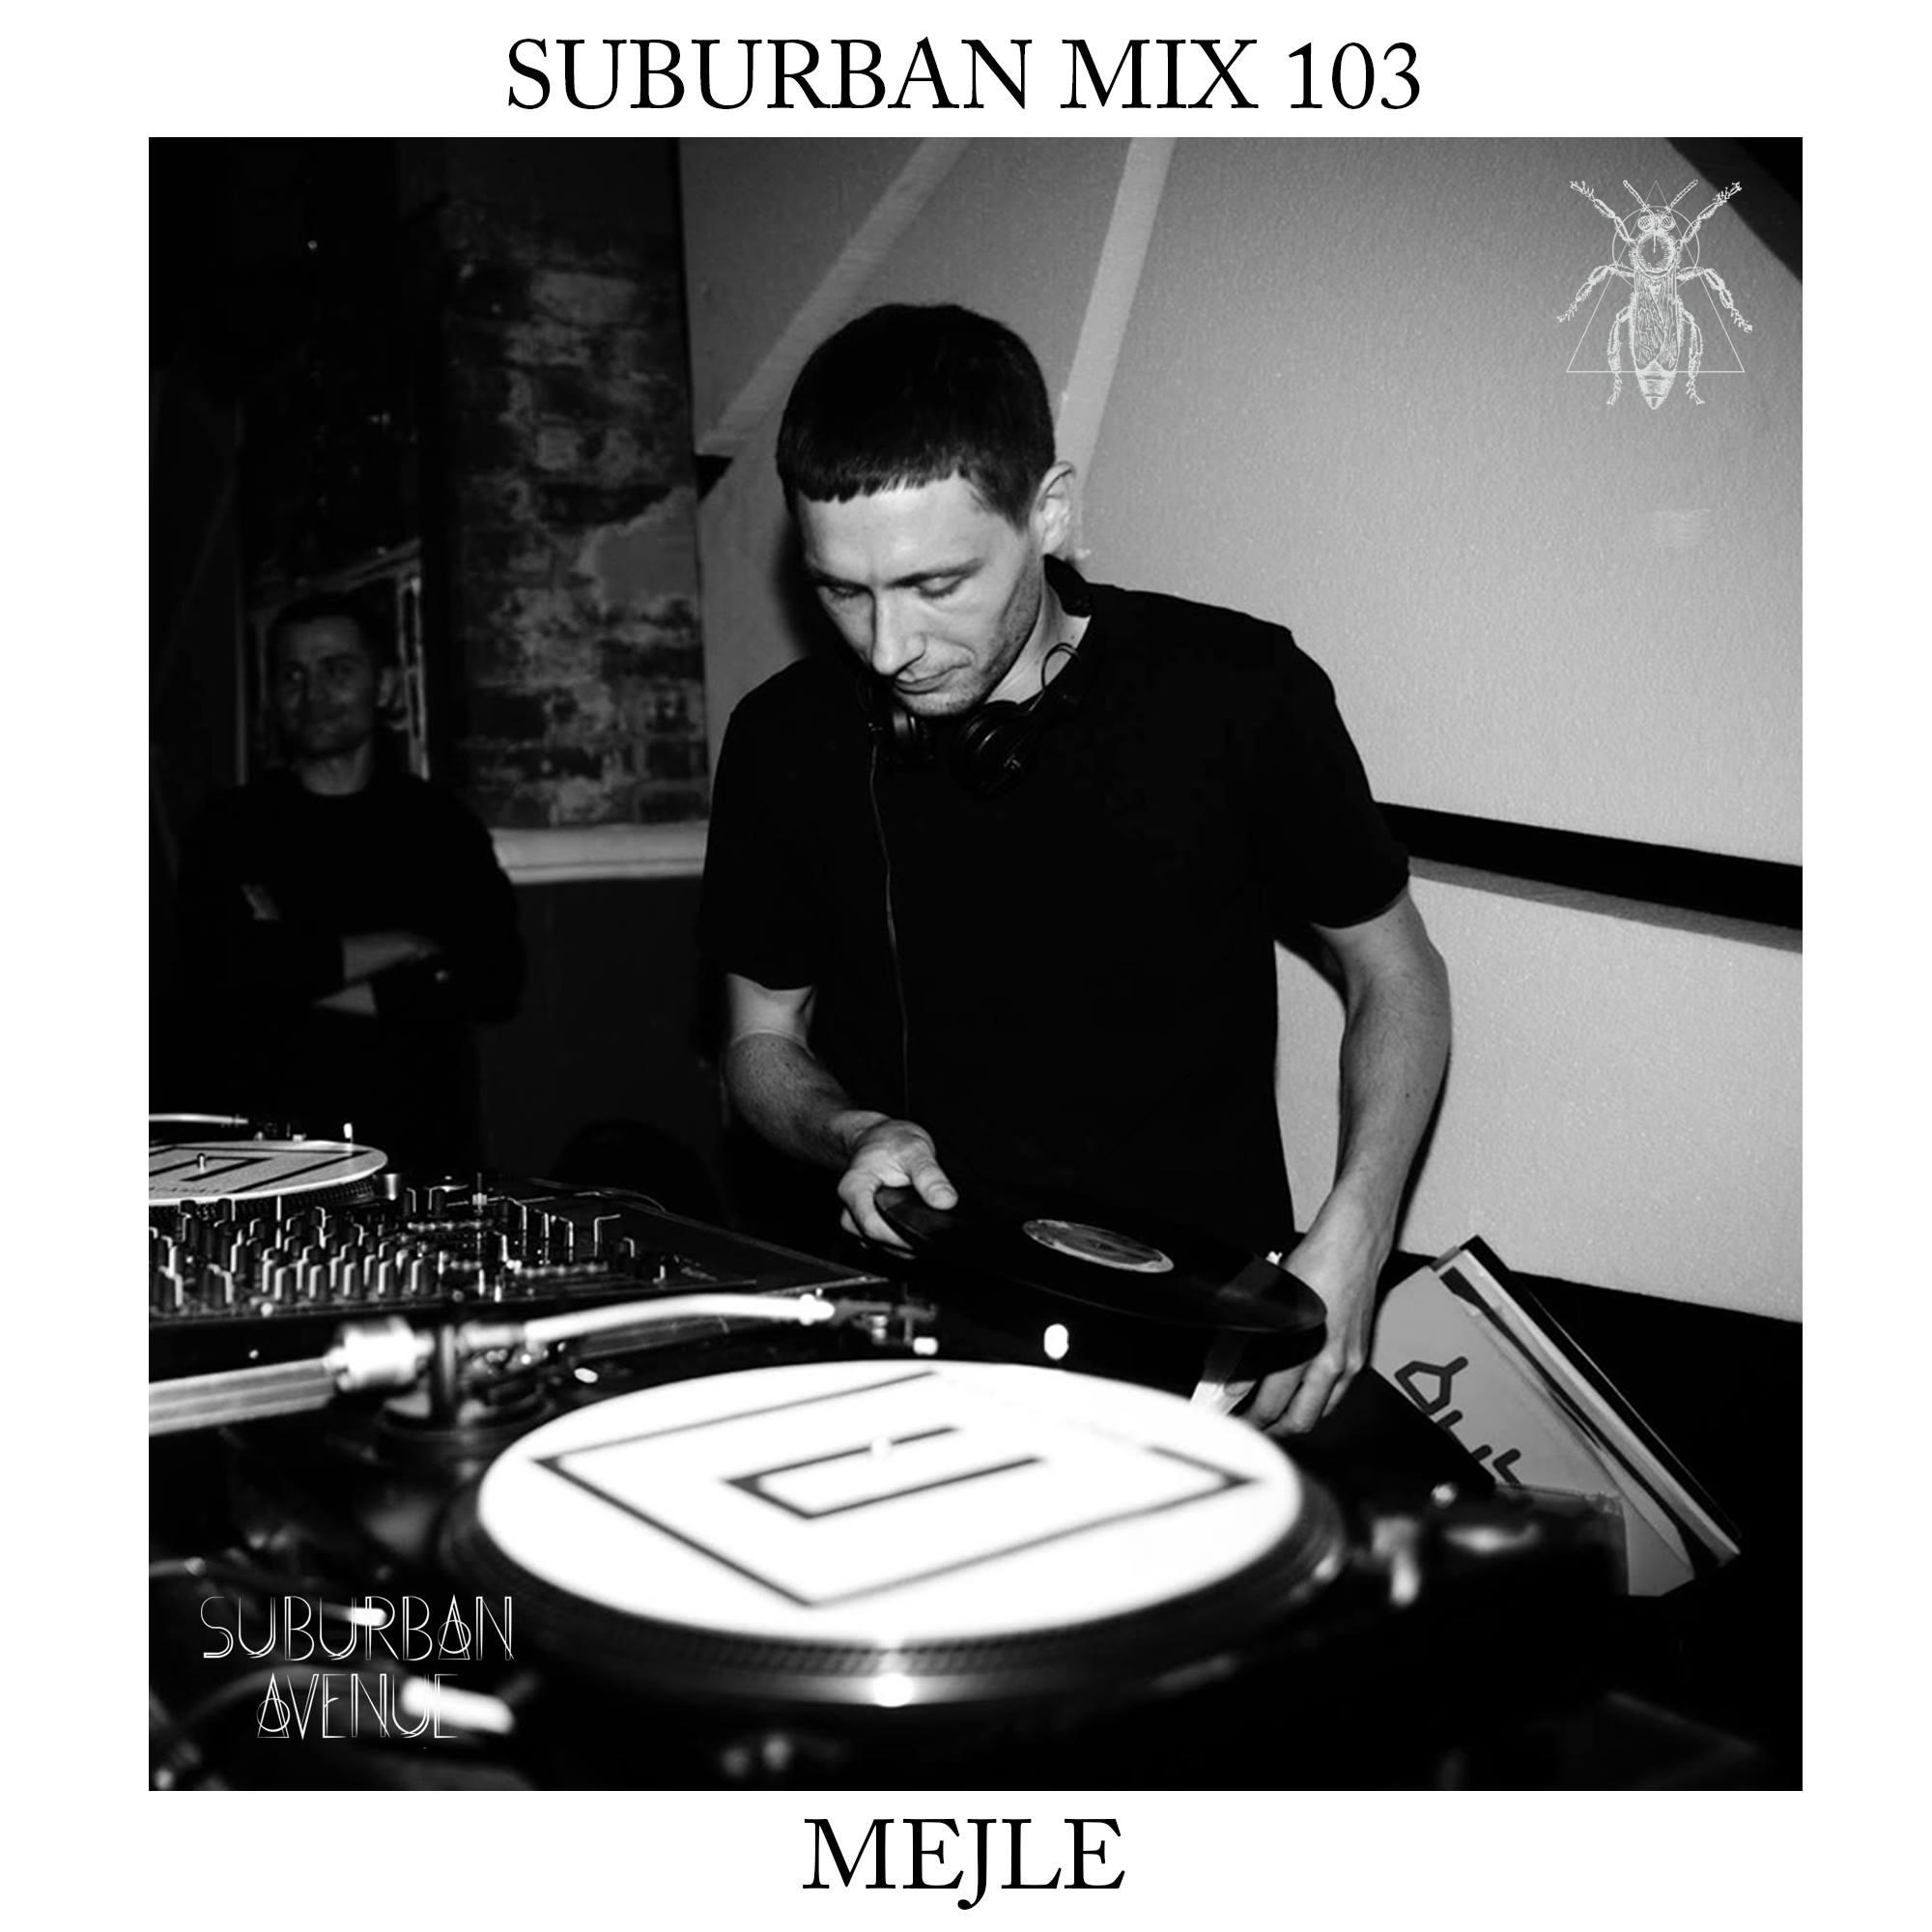 Suburban Mix 103 - Mejle